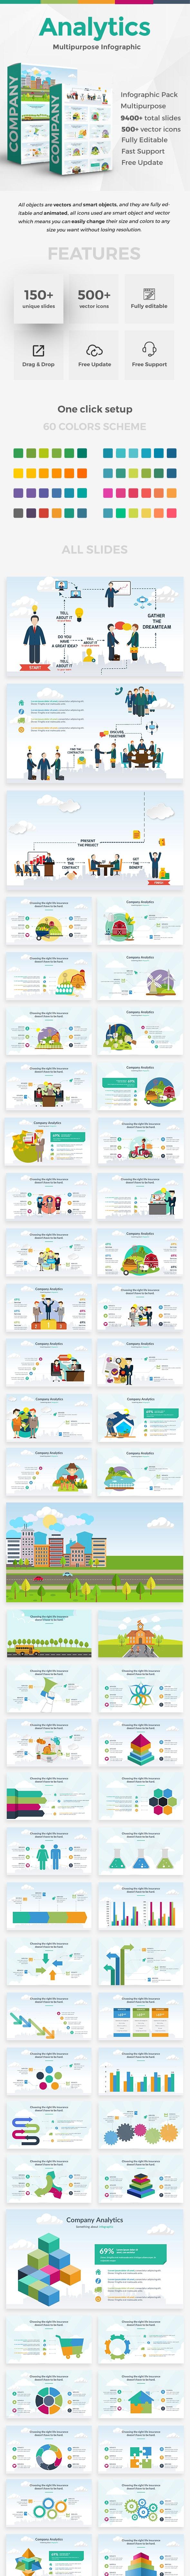 Company Analytics Infographic Google Slide Template - Google Slides Presentation Templates